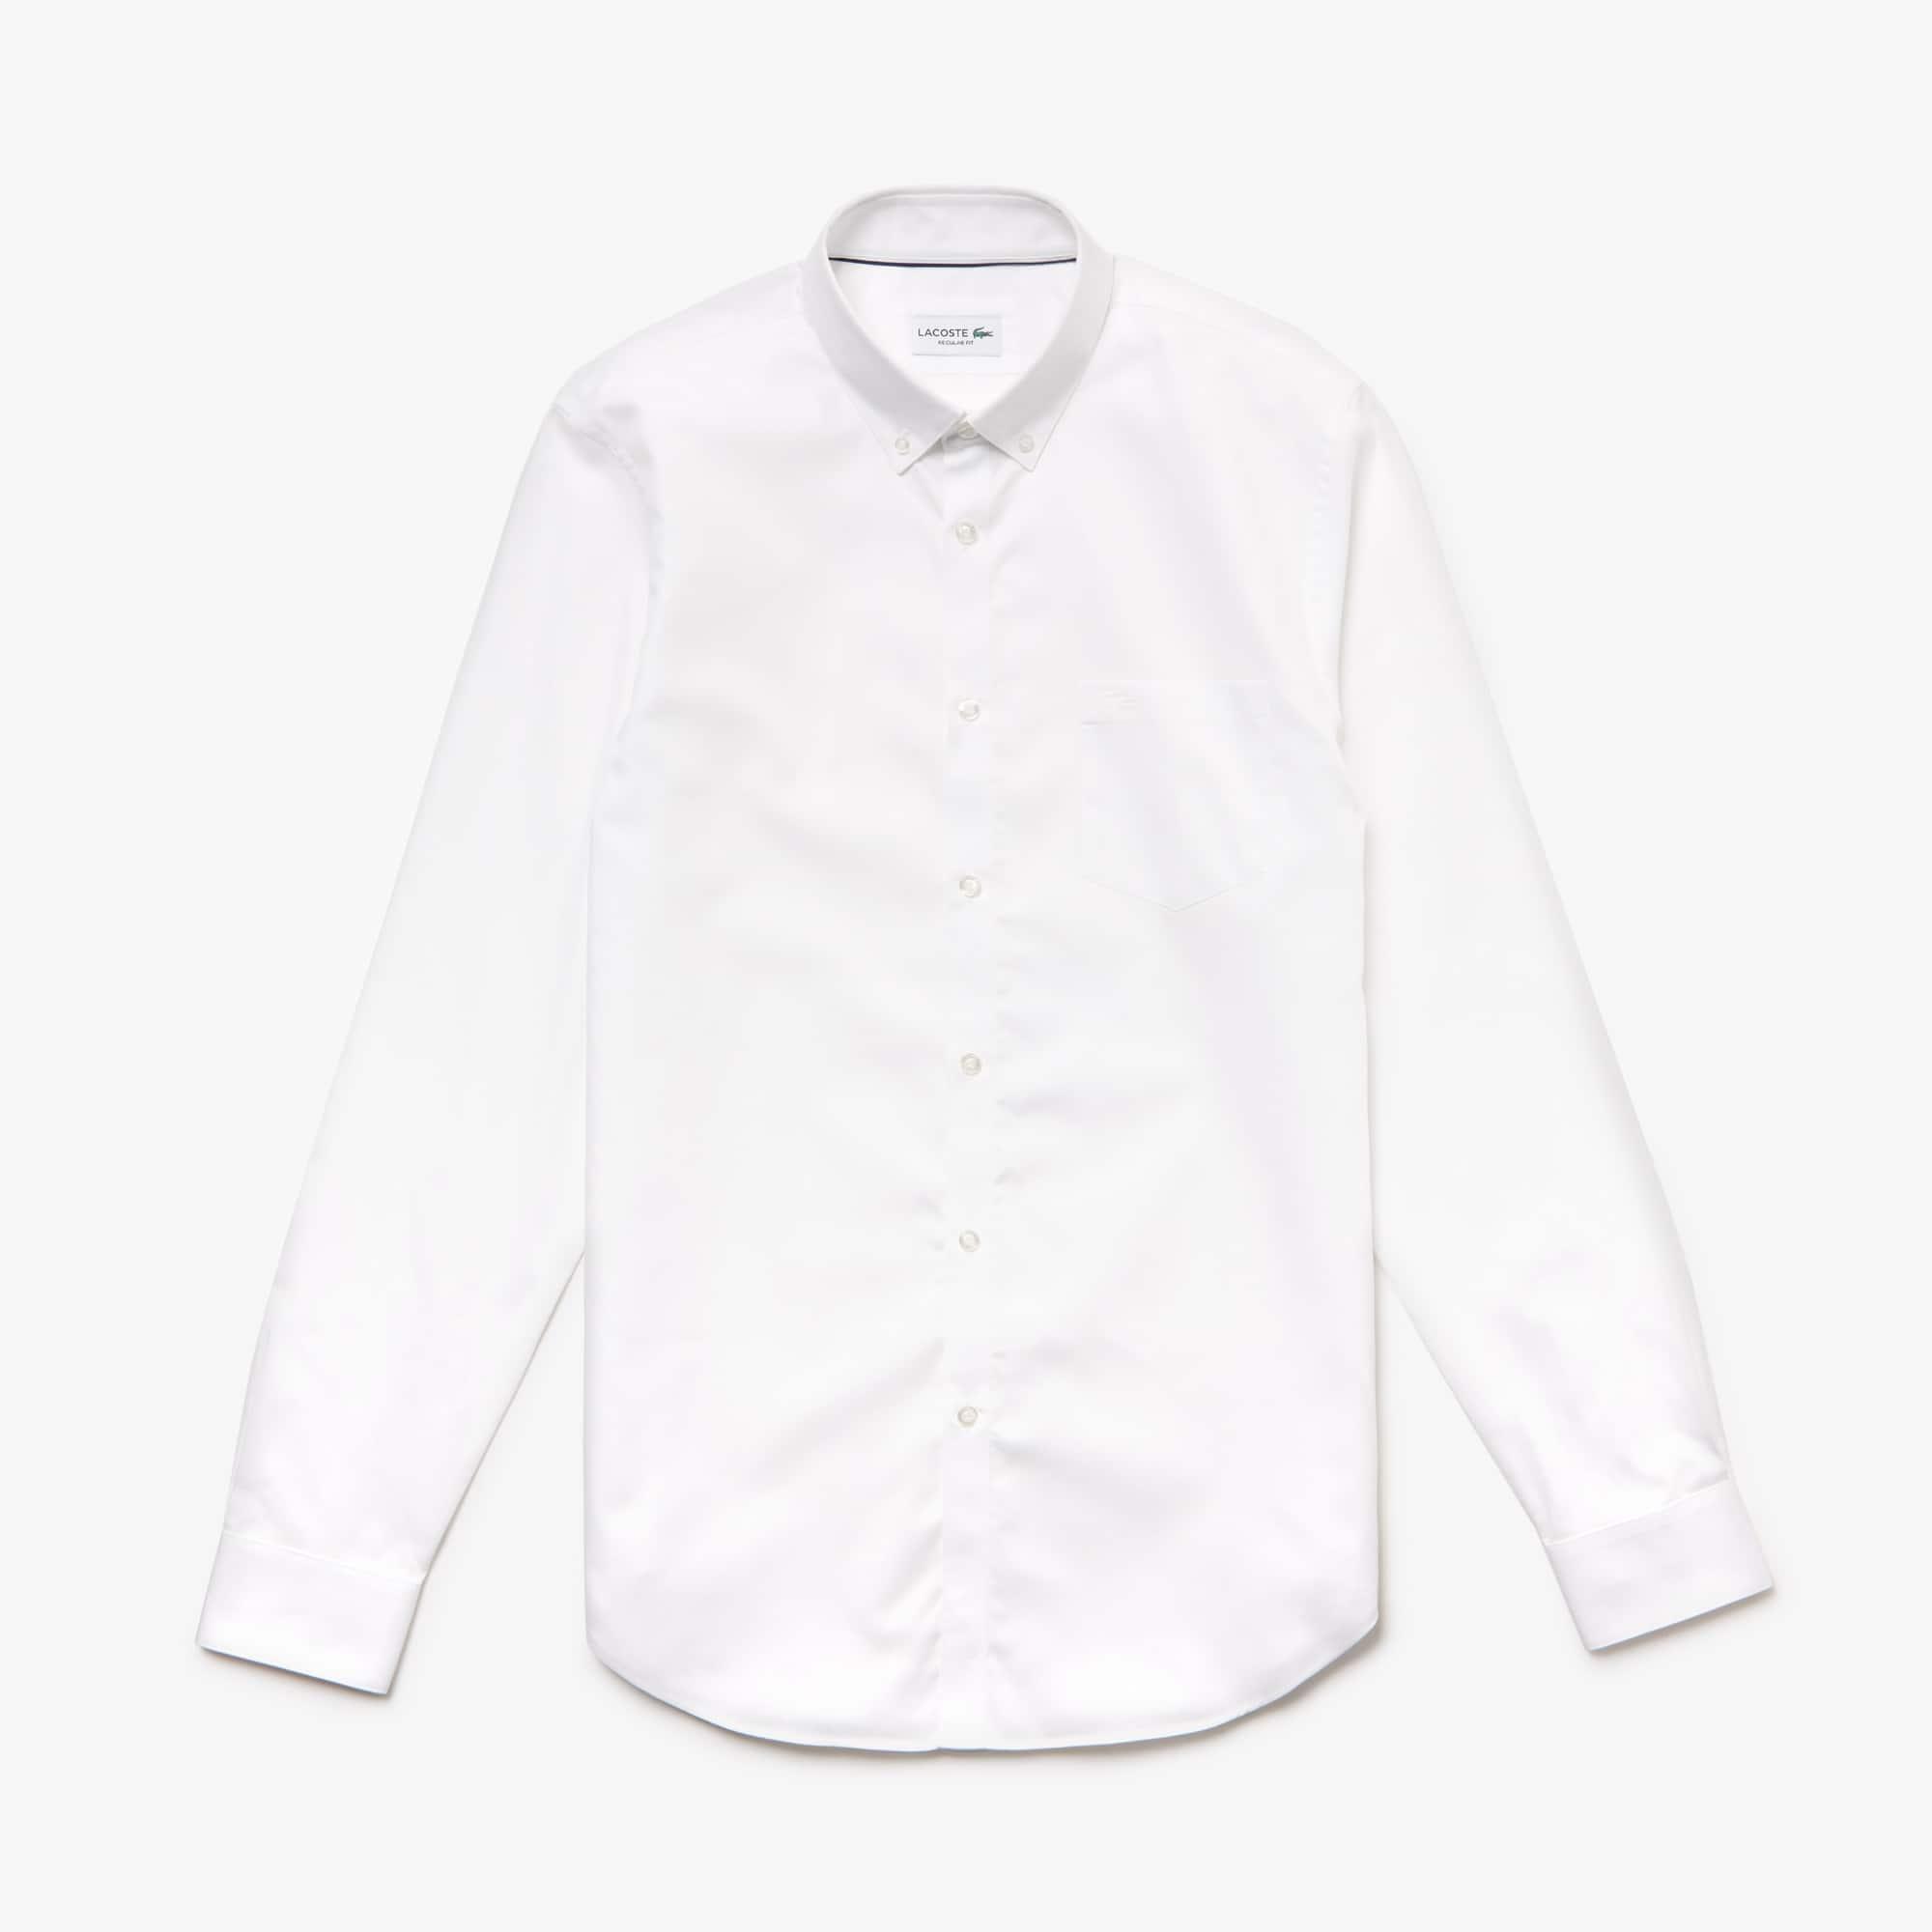 Regular Fit Herren-Hemd aus Baumwoll-Mini-Piqué